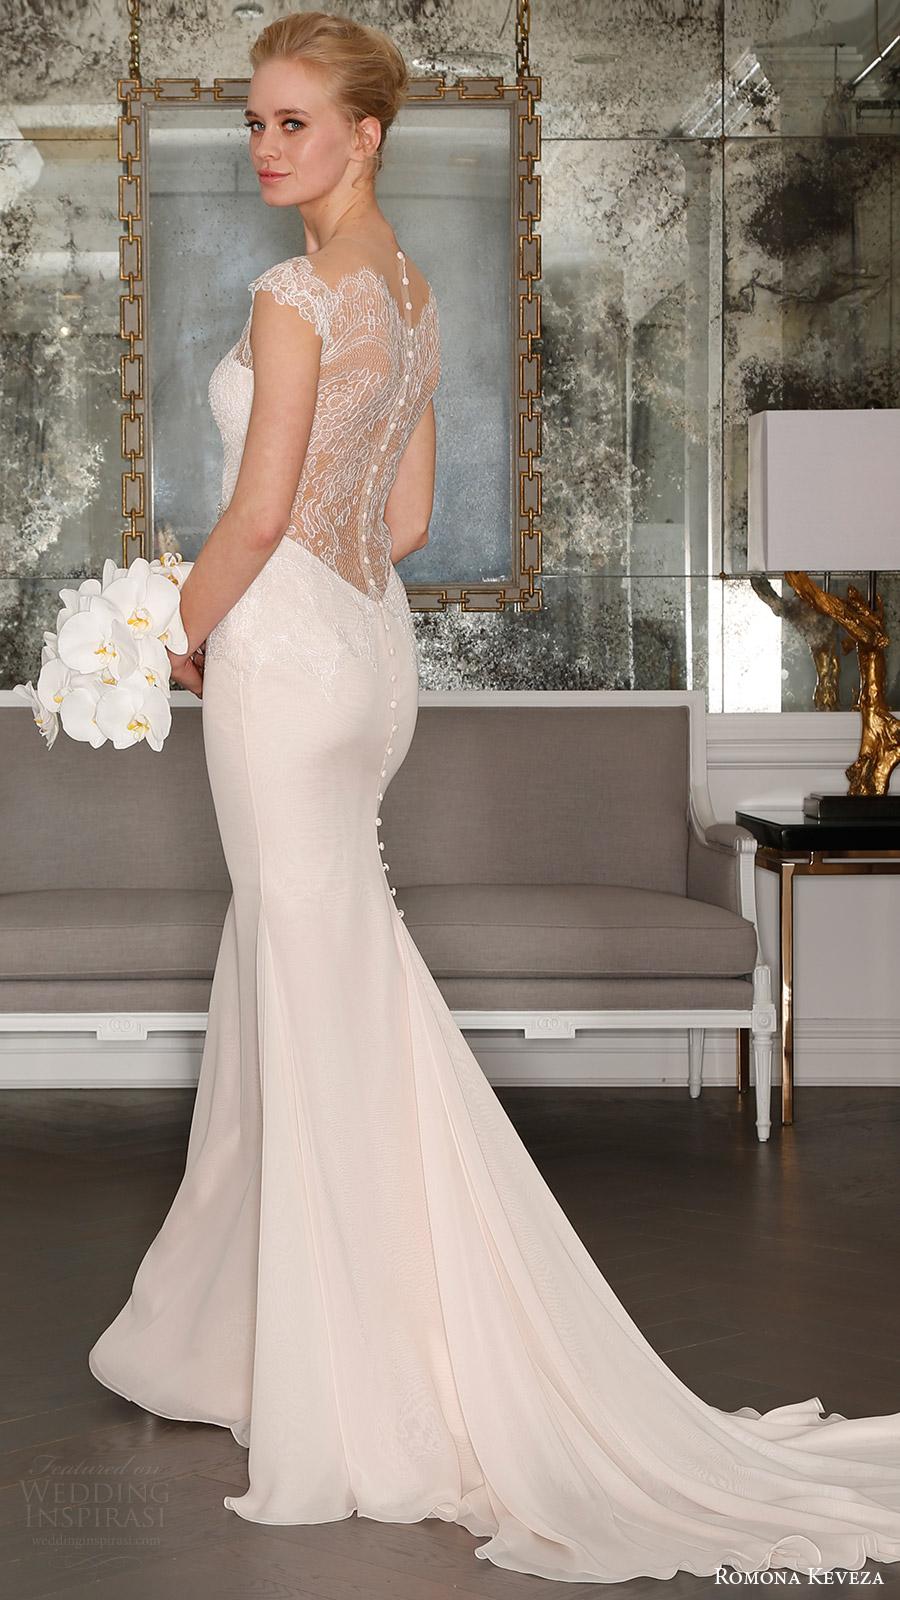 romona keveza bridal spring 2017 illusion cap sleeves sweetheart deep vneck sheath wedding dress (rk7405nt) bv sheer back train